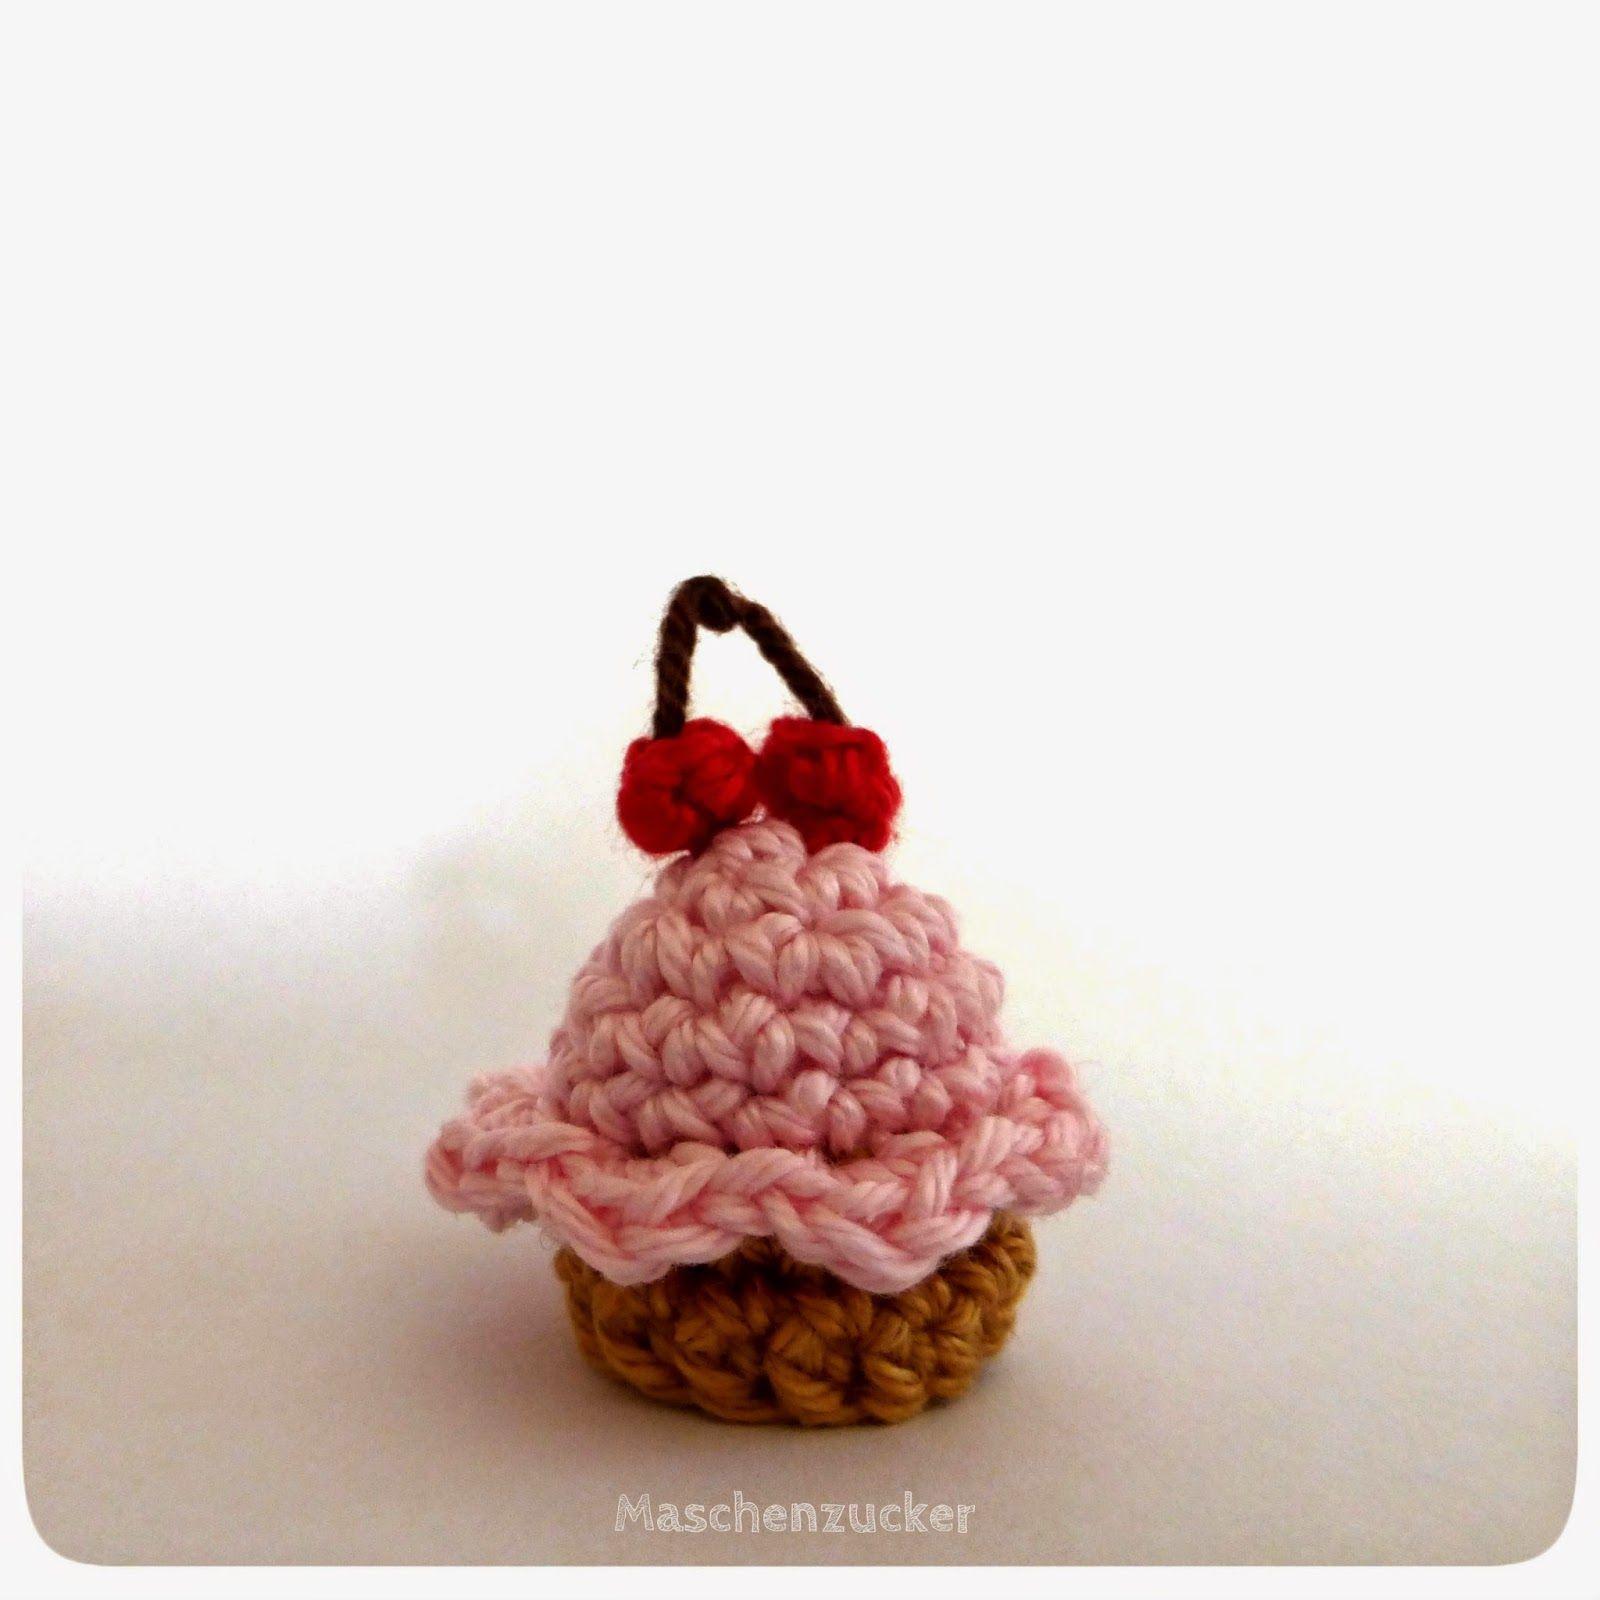 Mini-Kirsch-Muffin Mini-Cherry-Muffin   miniatur   Pinterest ...